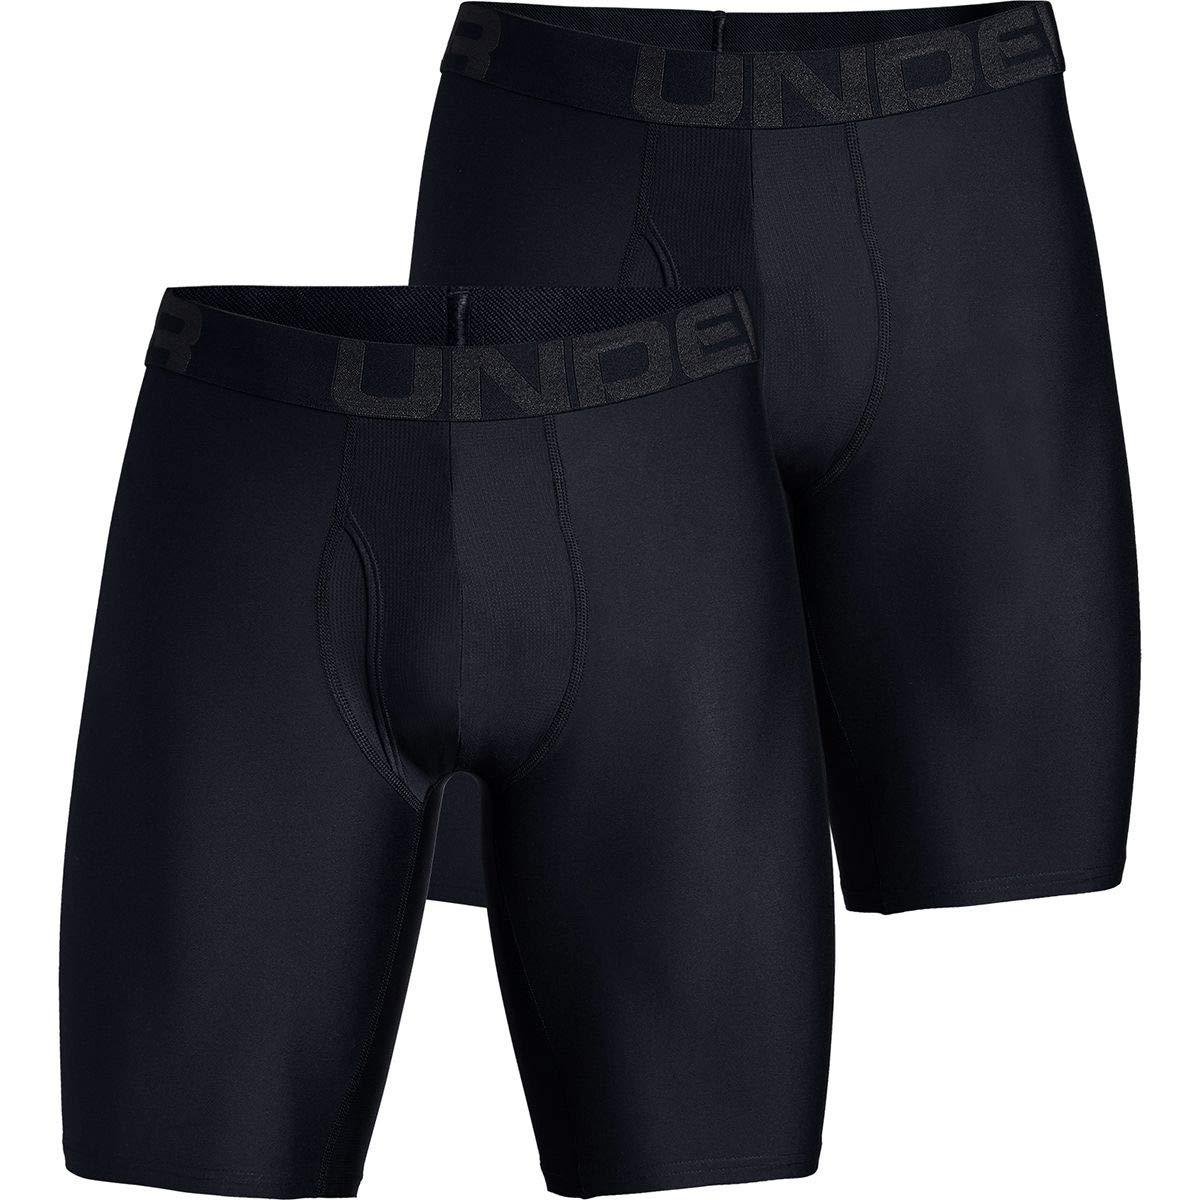 Under Armour Tech 9in Underwear - 2-Pack - Men's Black/Black, L by Under Armour